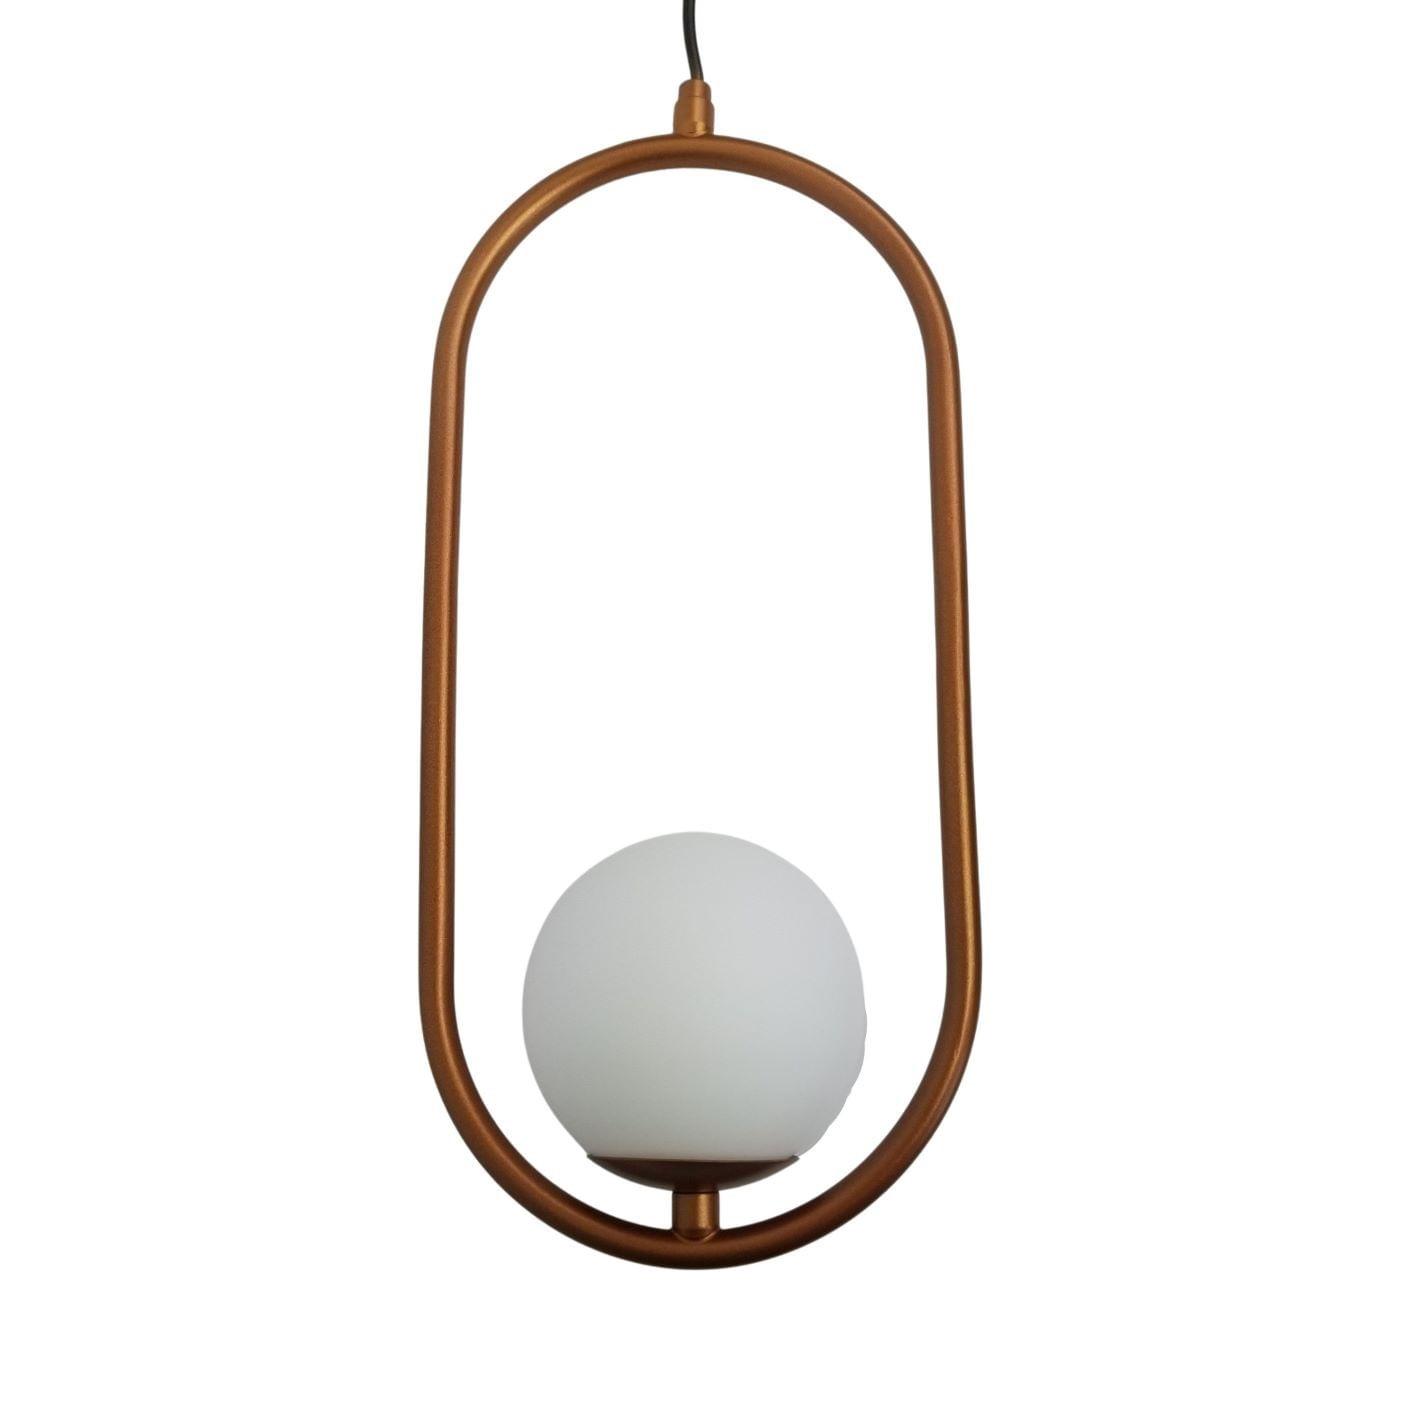 Kit 2 Pendentes Modernos Aro Oval Cobre com Globo Branco